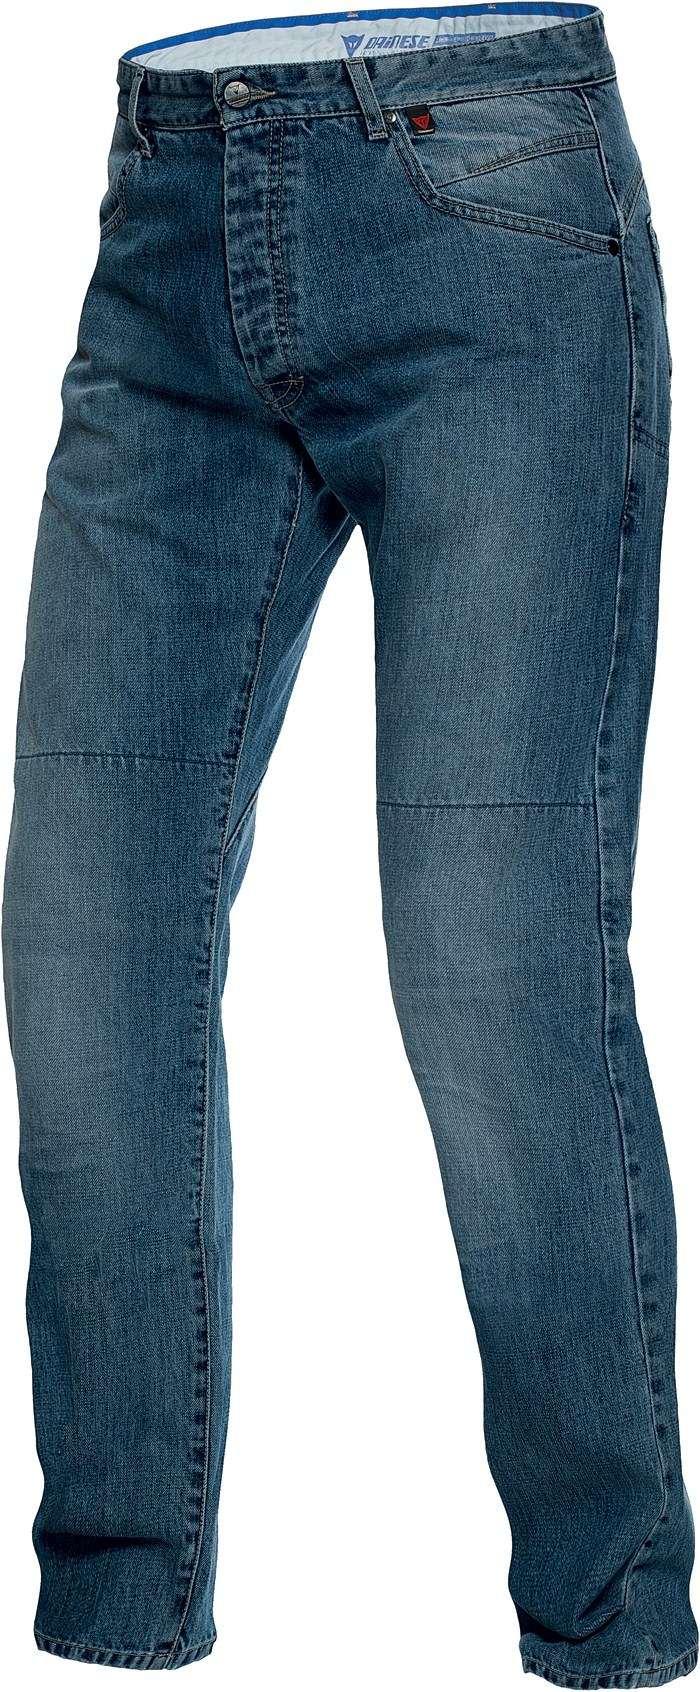 Jeans moto Dainese Bonneville regular Denim medio